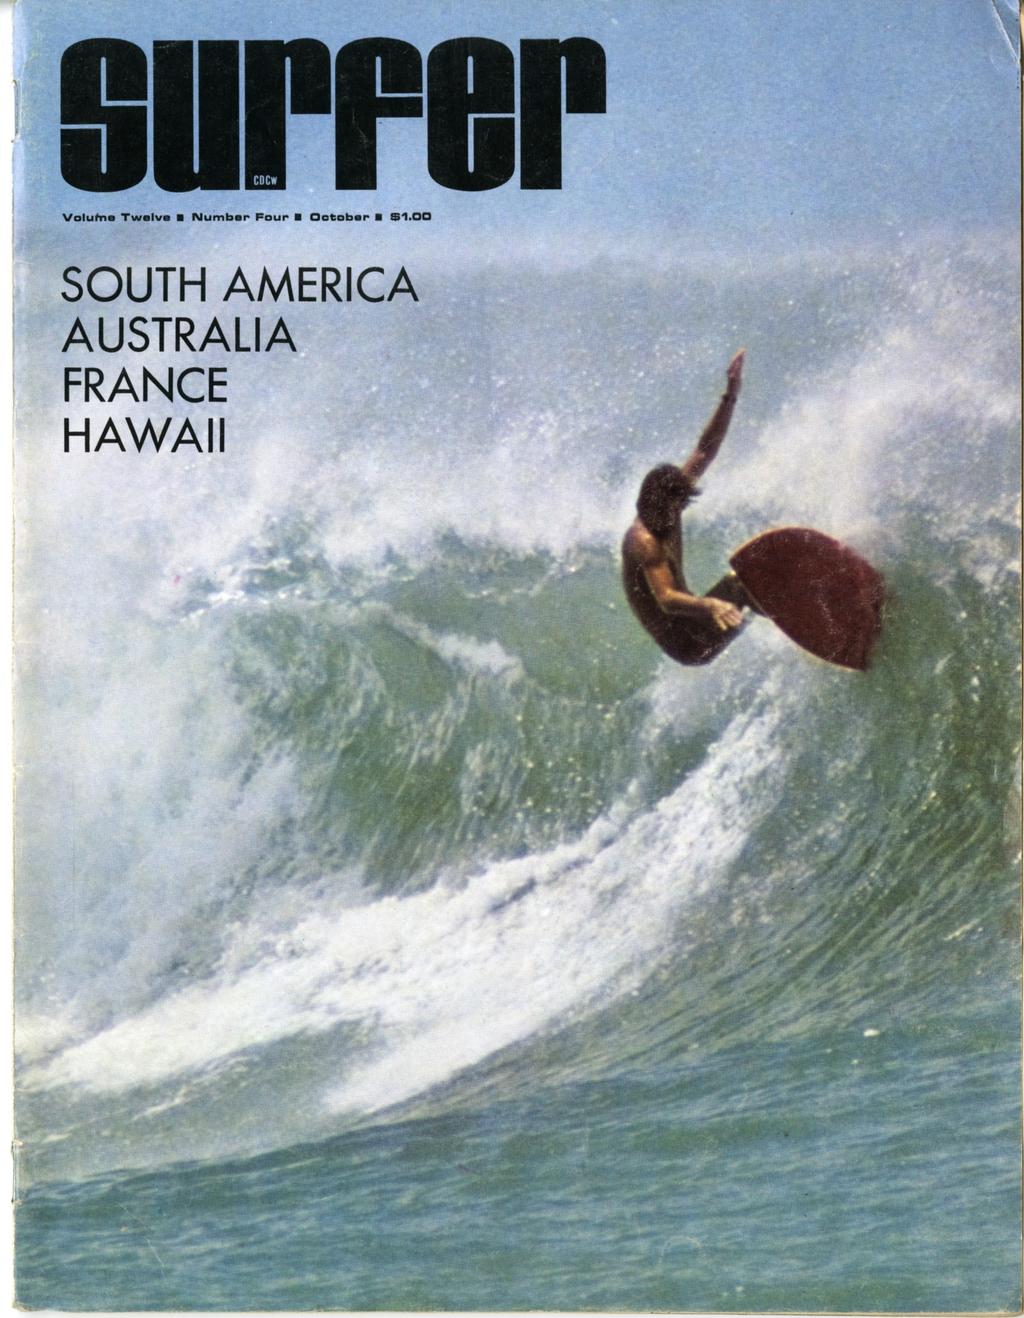 First cover shot, Ala Moana | John Severson | 1971